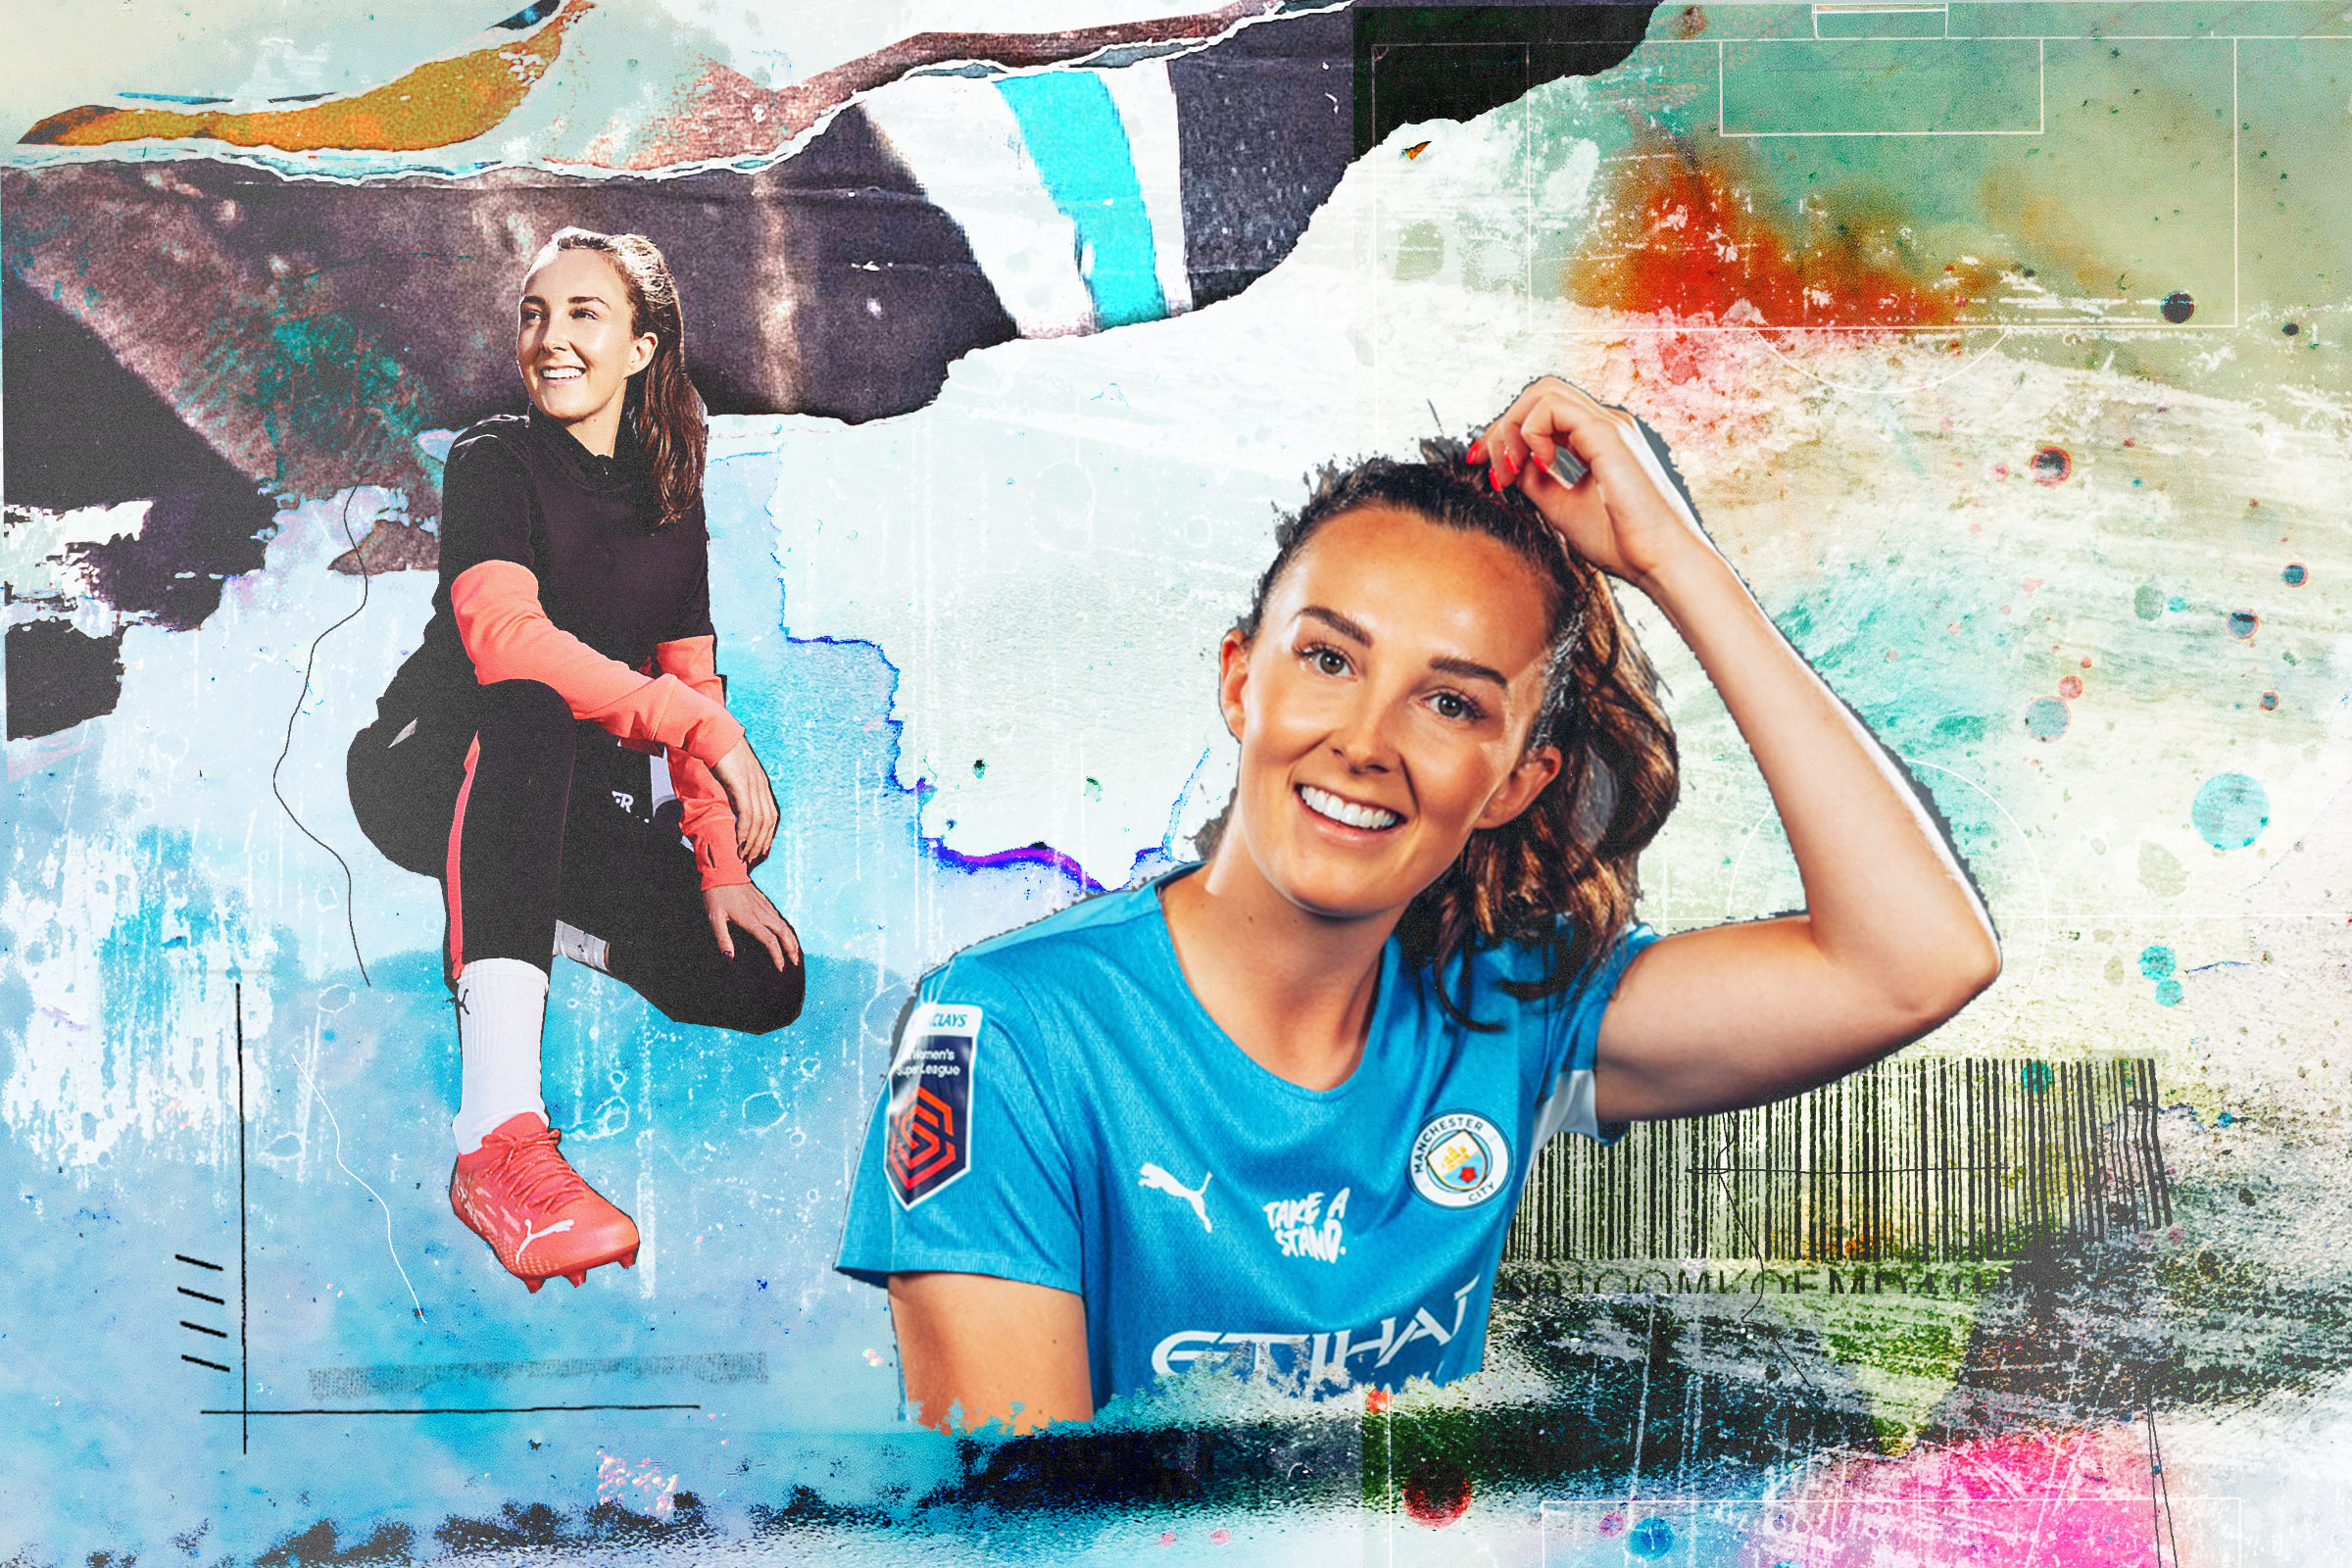 Female athlete illustration collage